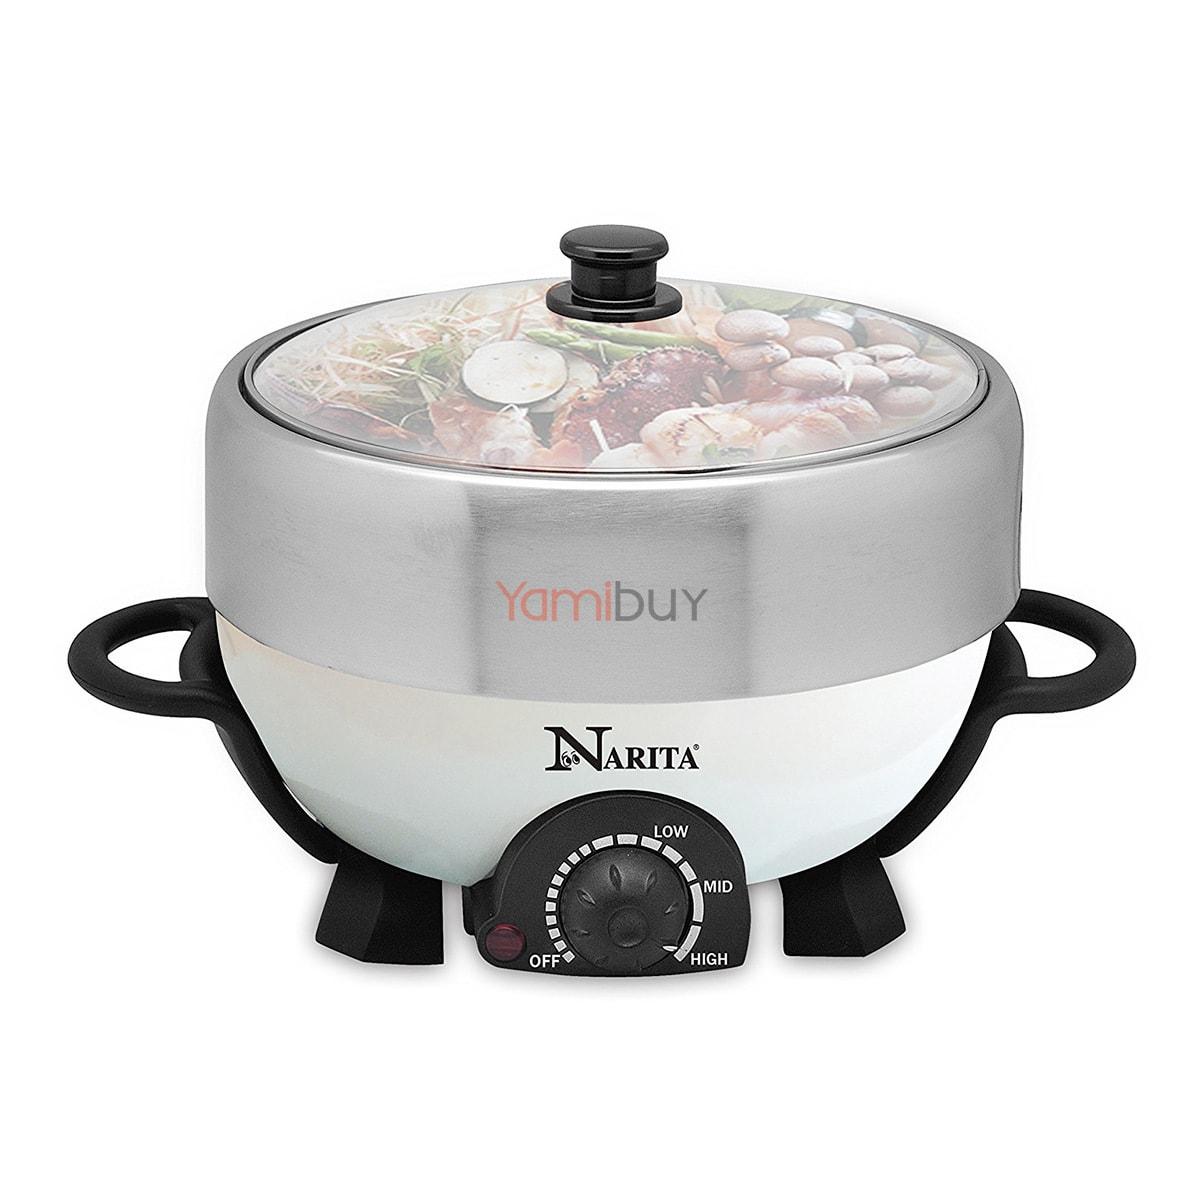 Yamibuy.com:Customer reviews:Narita Multi-function Hot Pot With Nonstick Grill Pan 4L NEC-402W (1 Year Mfg Warranty)